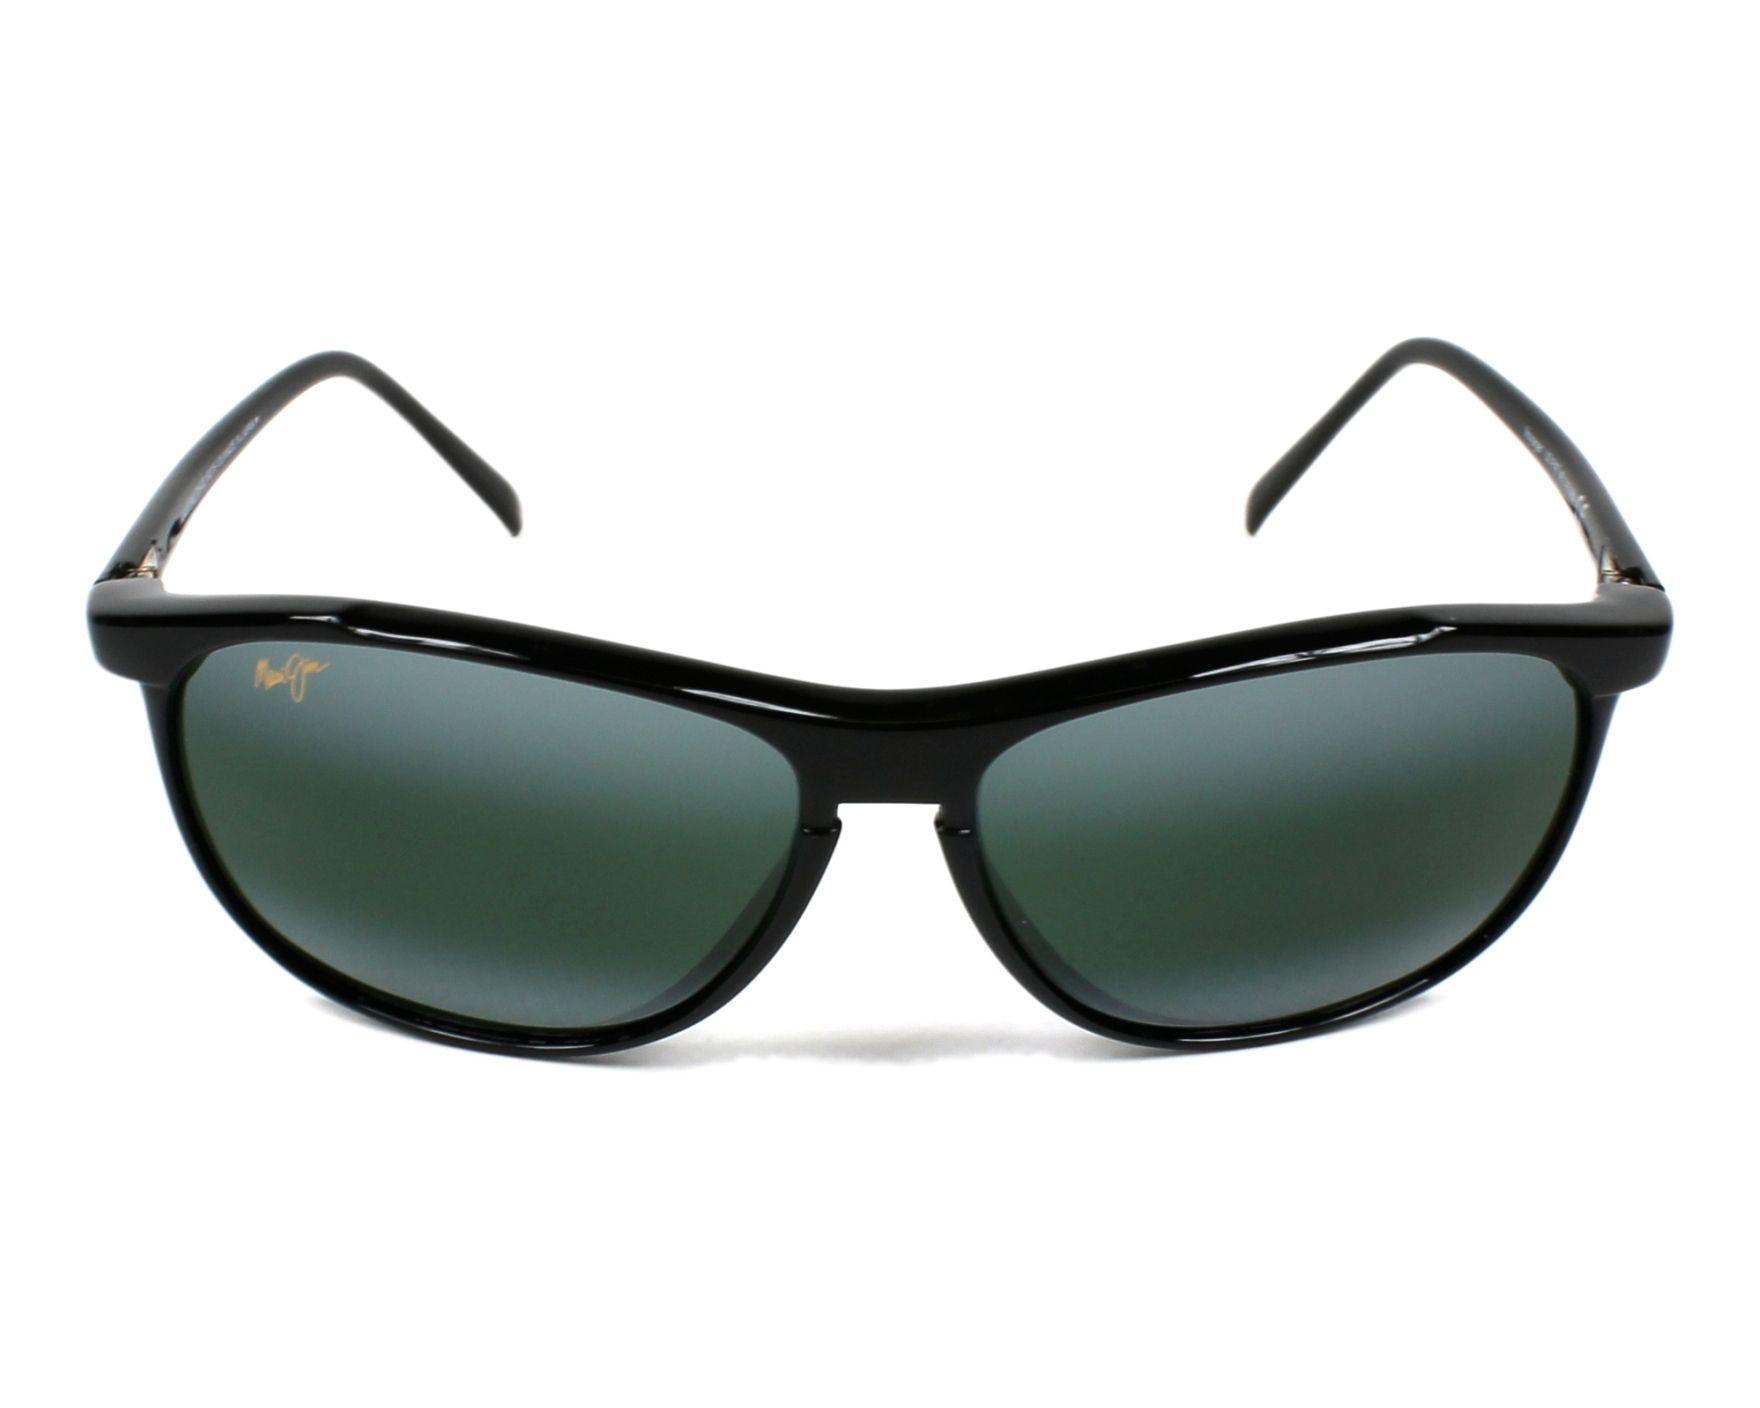 4d5c18e6538b Sunglasses Maui Jim 178 02 - Black front view